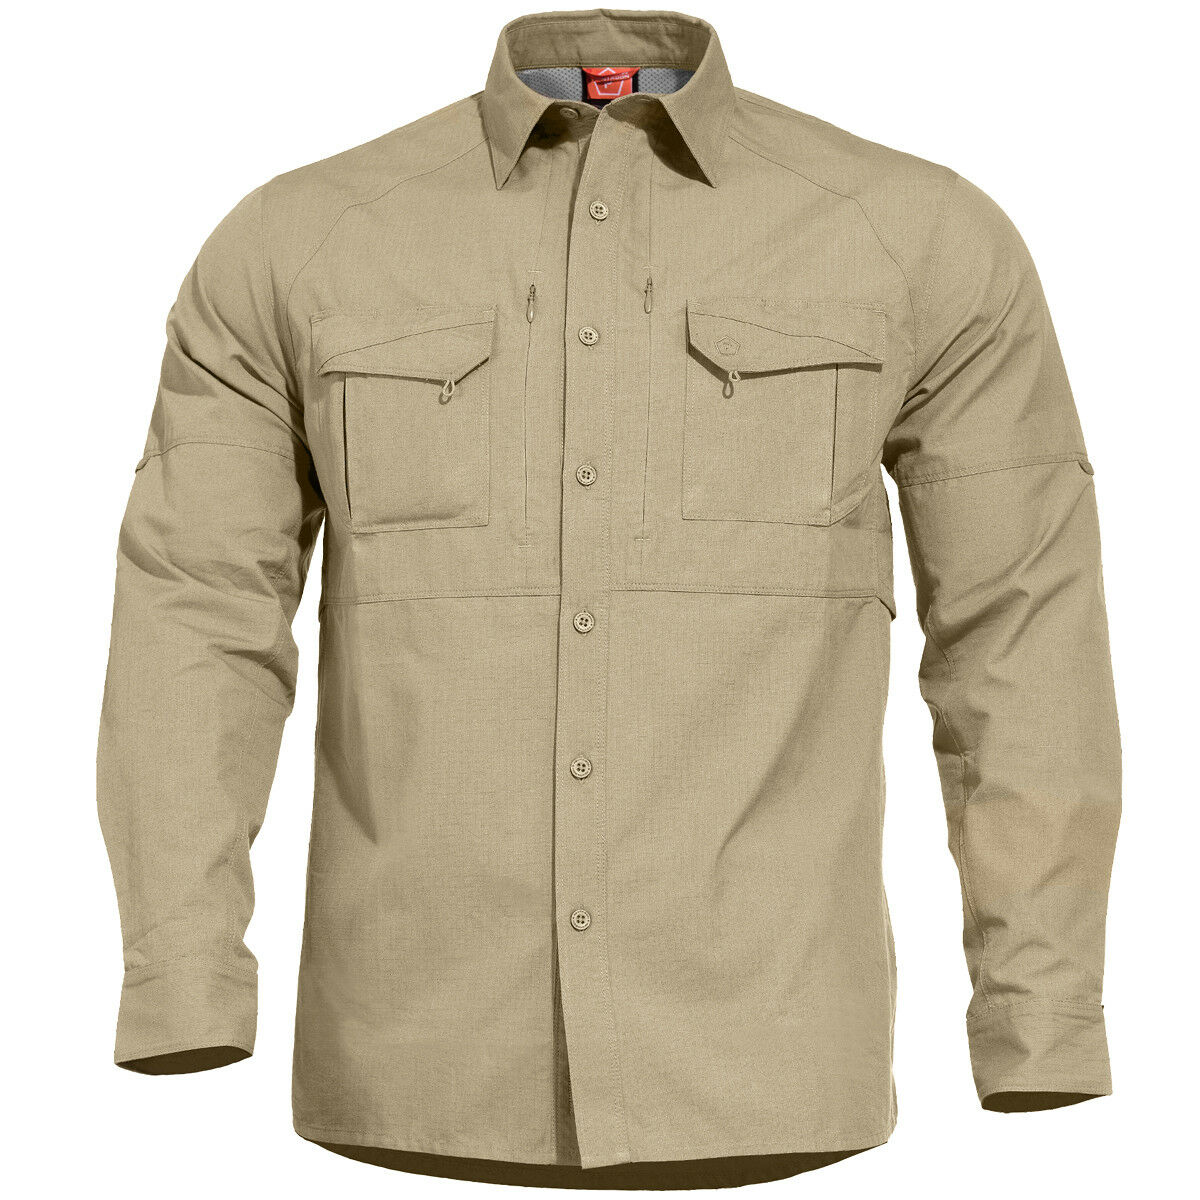 Pentagon Chase Tactical Shirt Long Sleeve Hiking Ranger Outdoor Casual Khaki